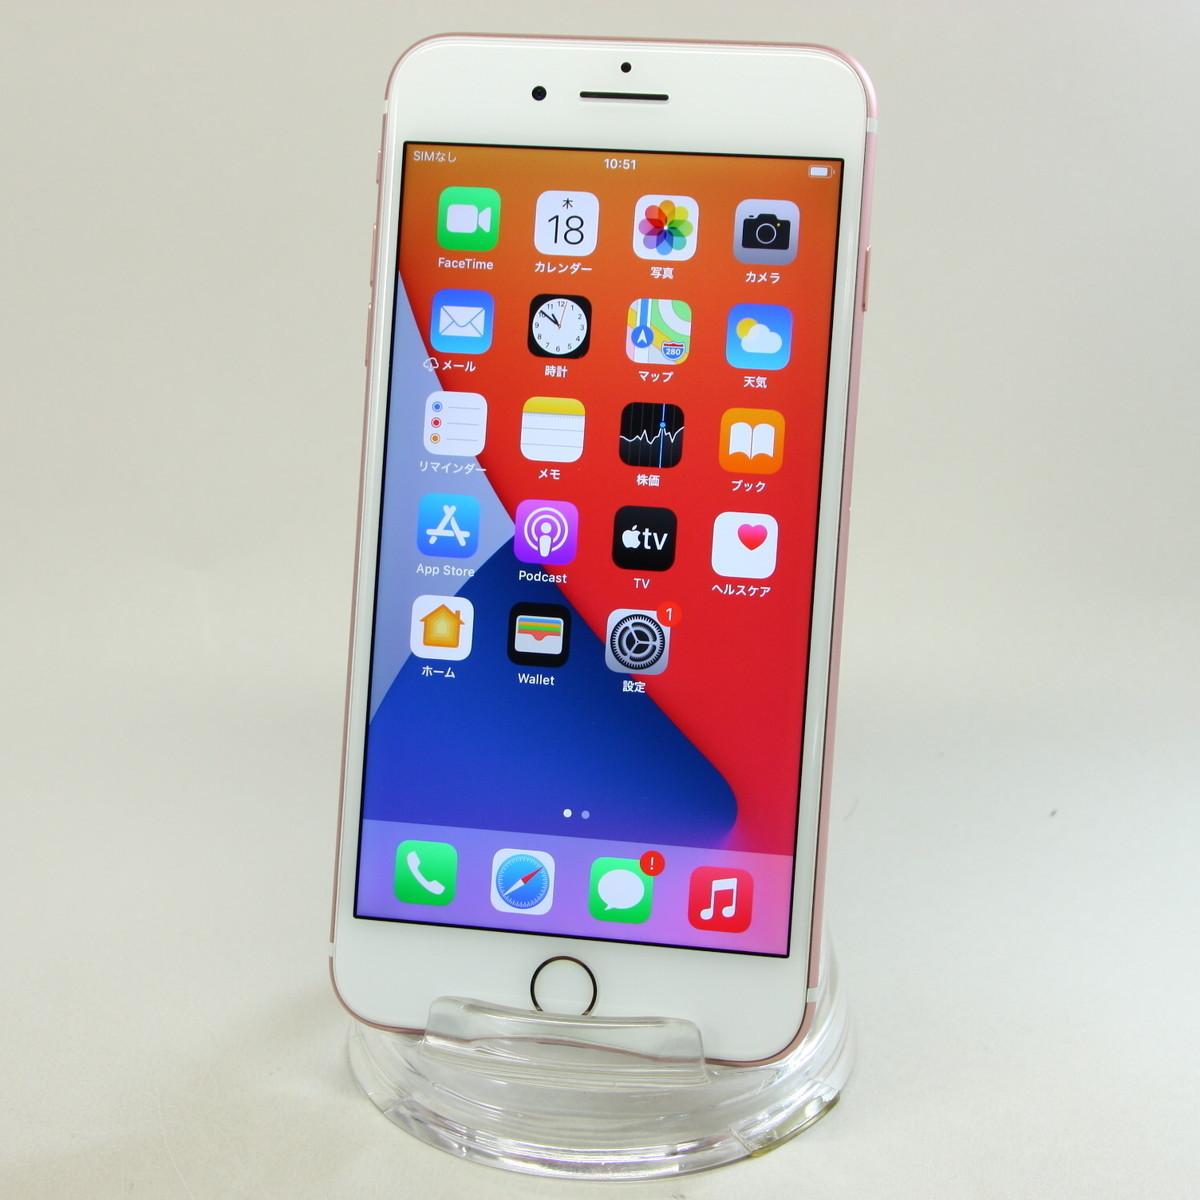 Apple iPhone7 Plus 128GB ローズゴールド A1785 MN6J2J/A バッテリ82%■ソフトバンク★Joshin9408【送料無料・1円】